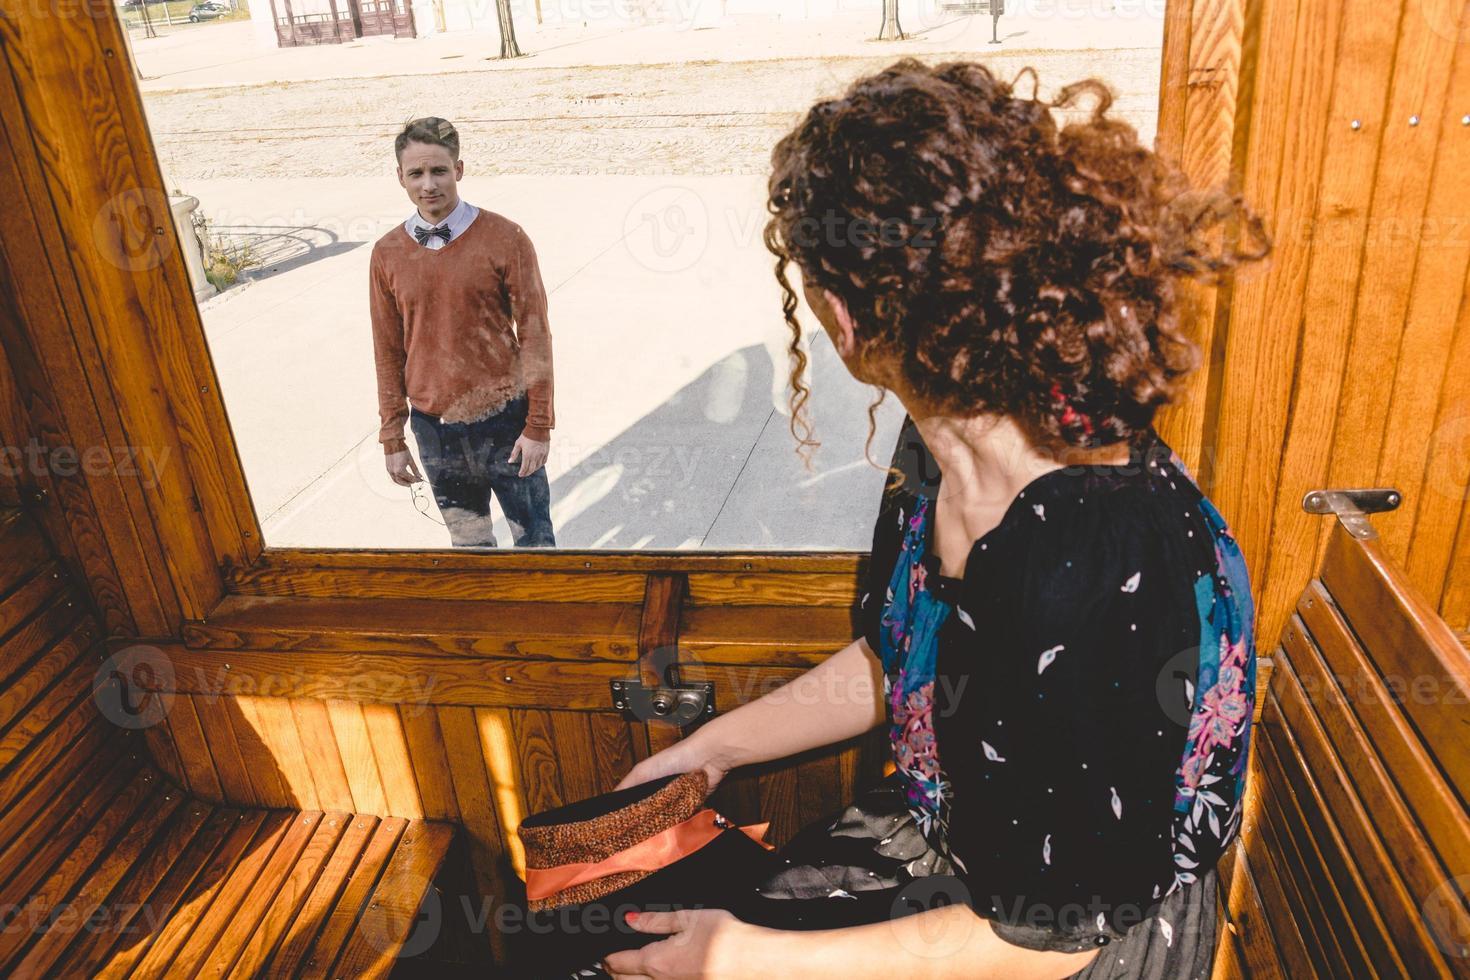 giovane donna che fluttua nel vagone o tram, congedo foto